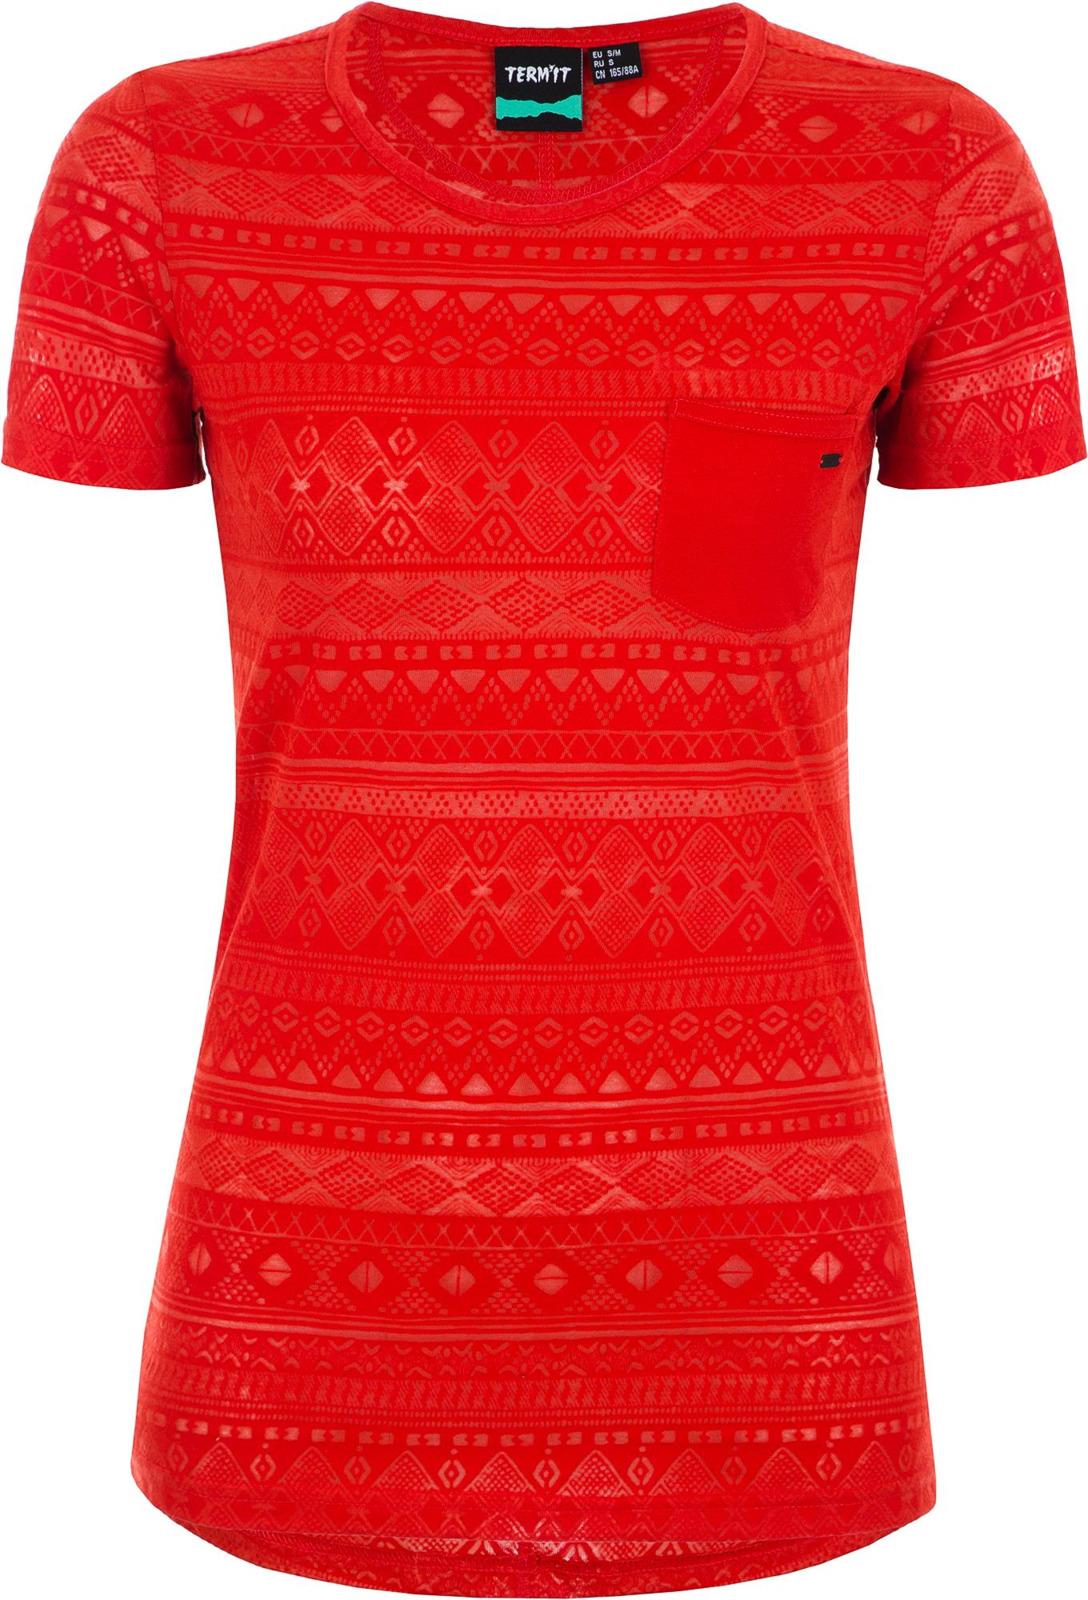 Футболка Termit Women's T-Shirt цены онлайн